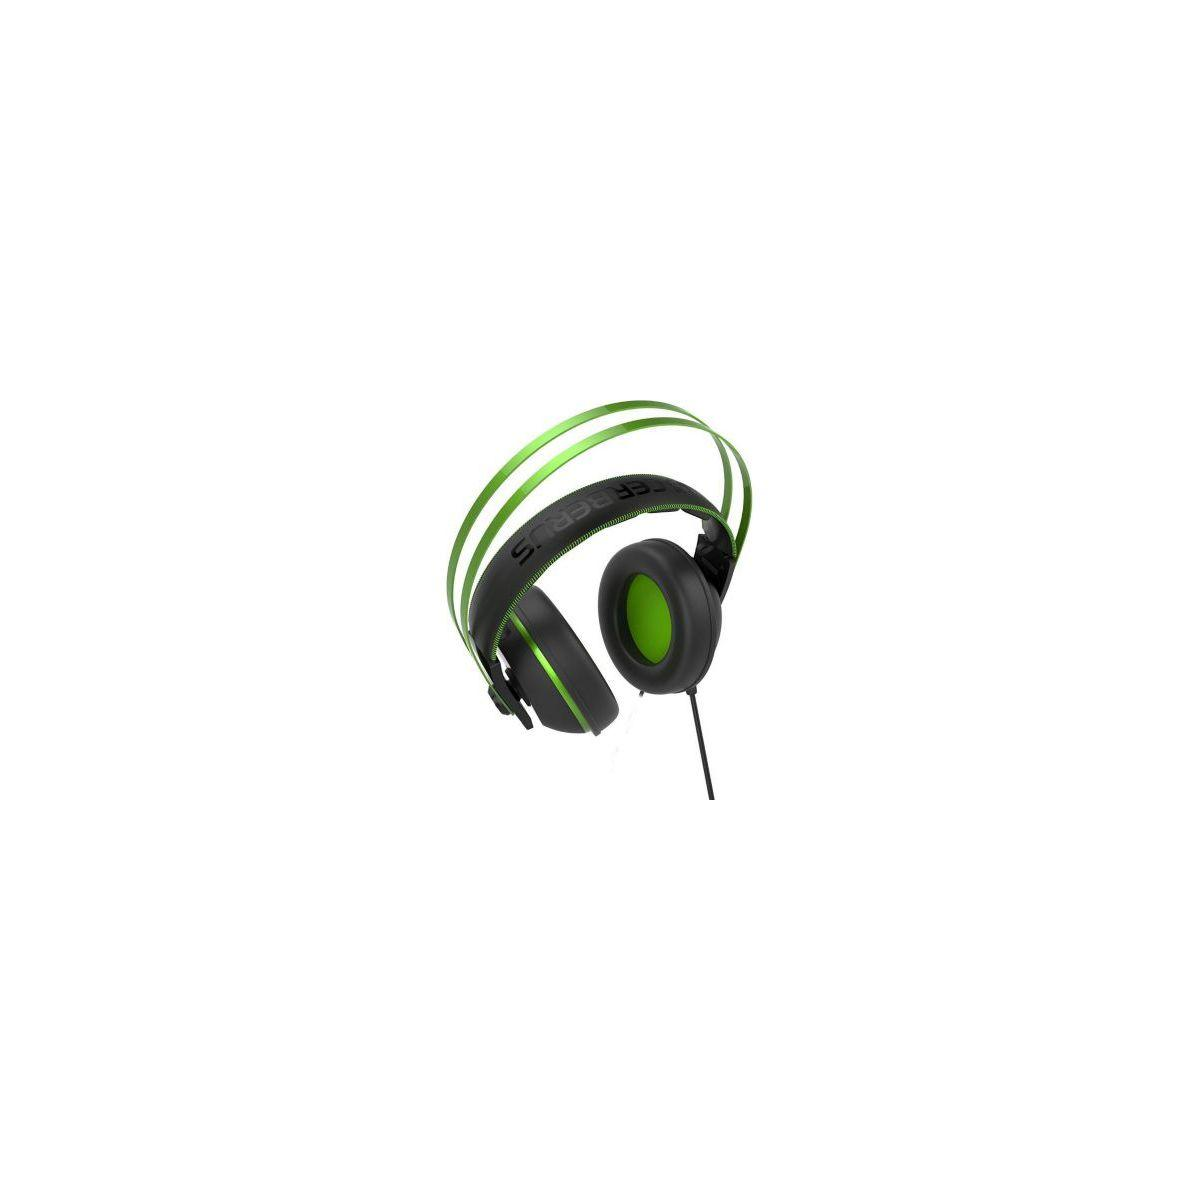 Casque gamer asus cerberus v2 vert - 2% de remise imm�diate avec le code : fete2